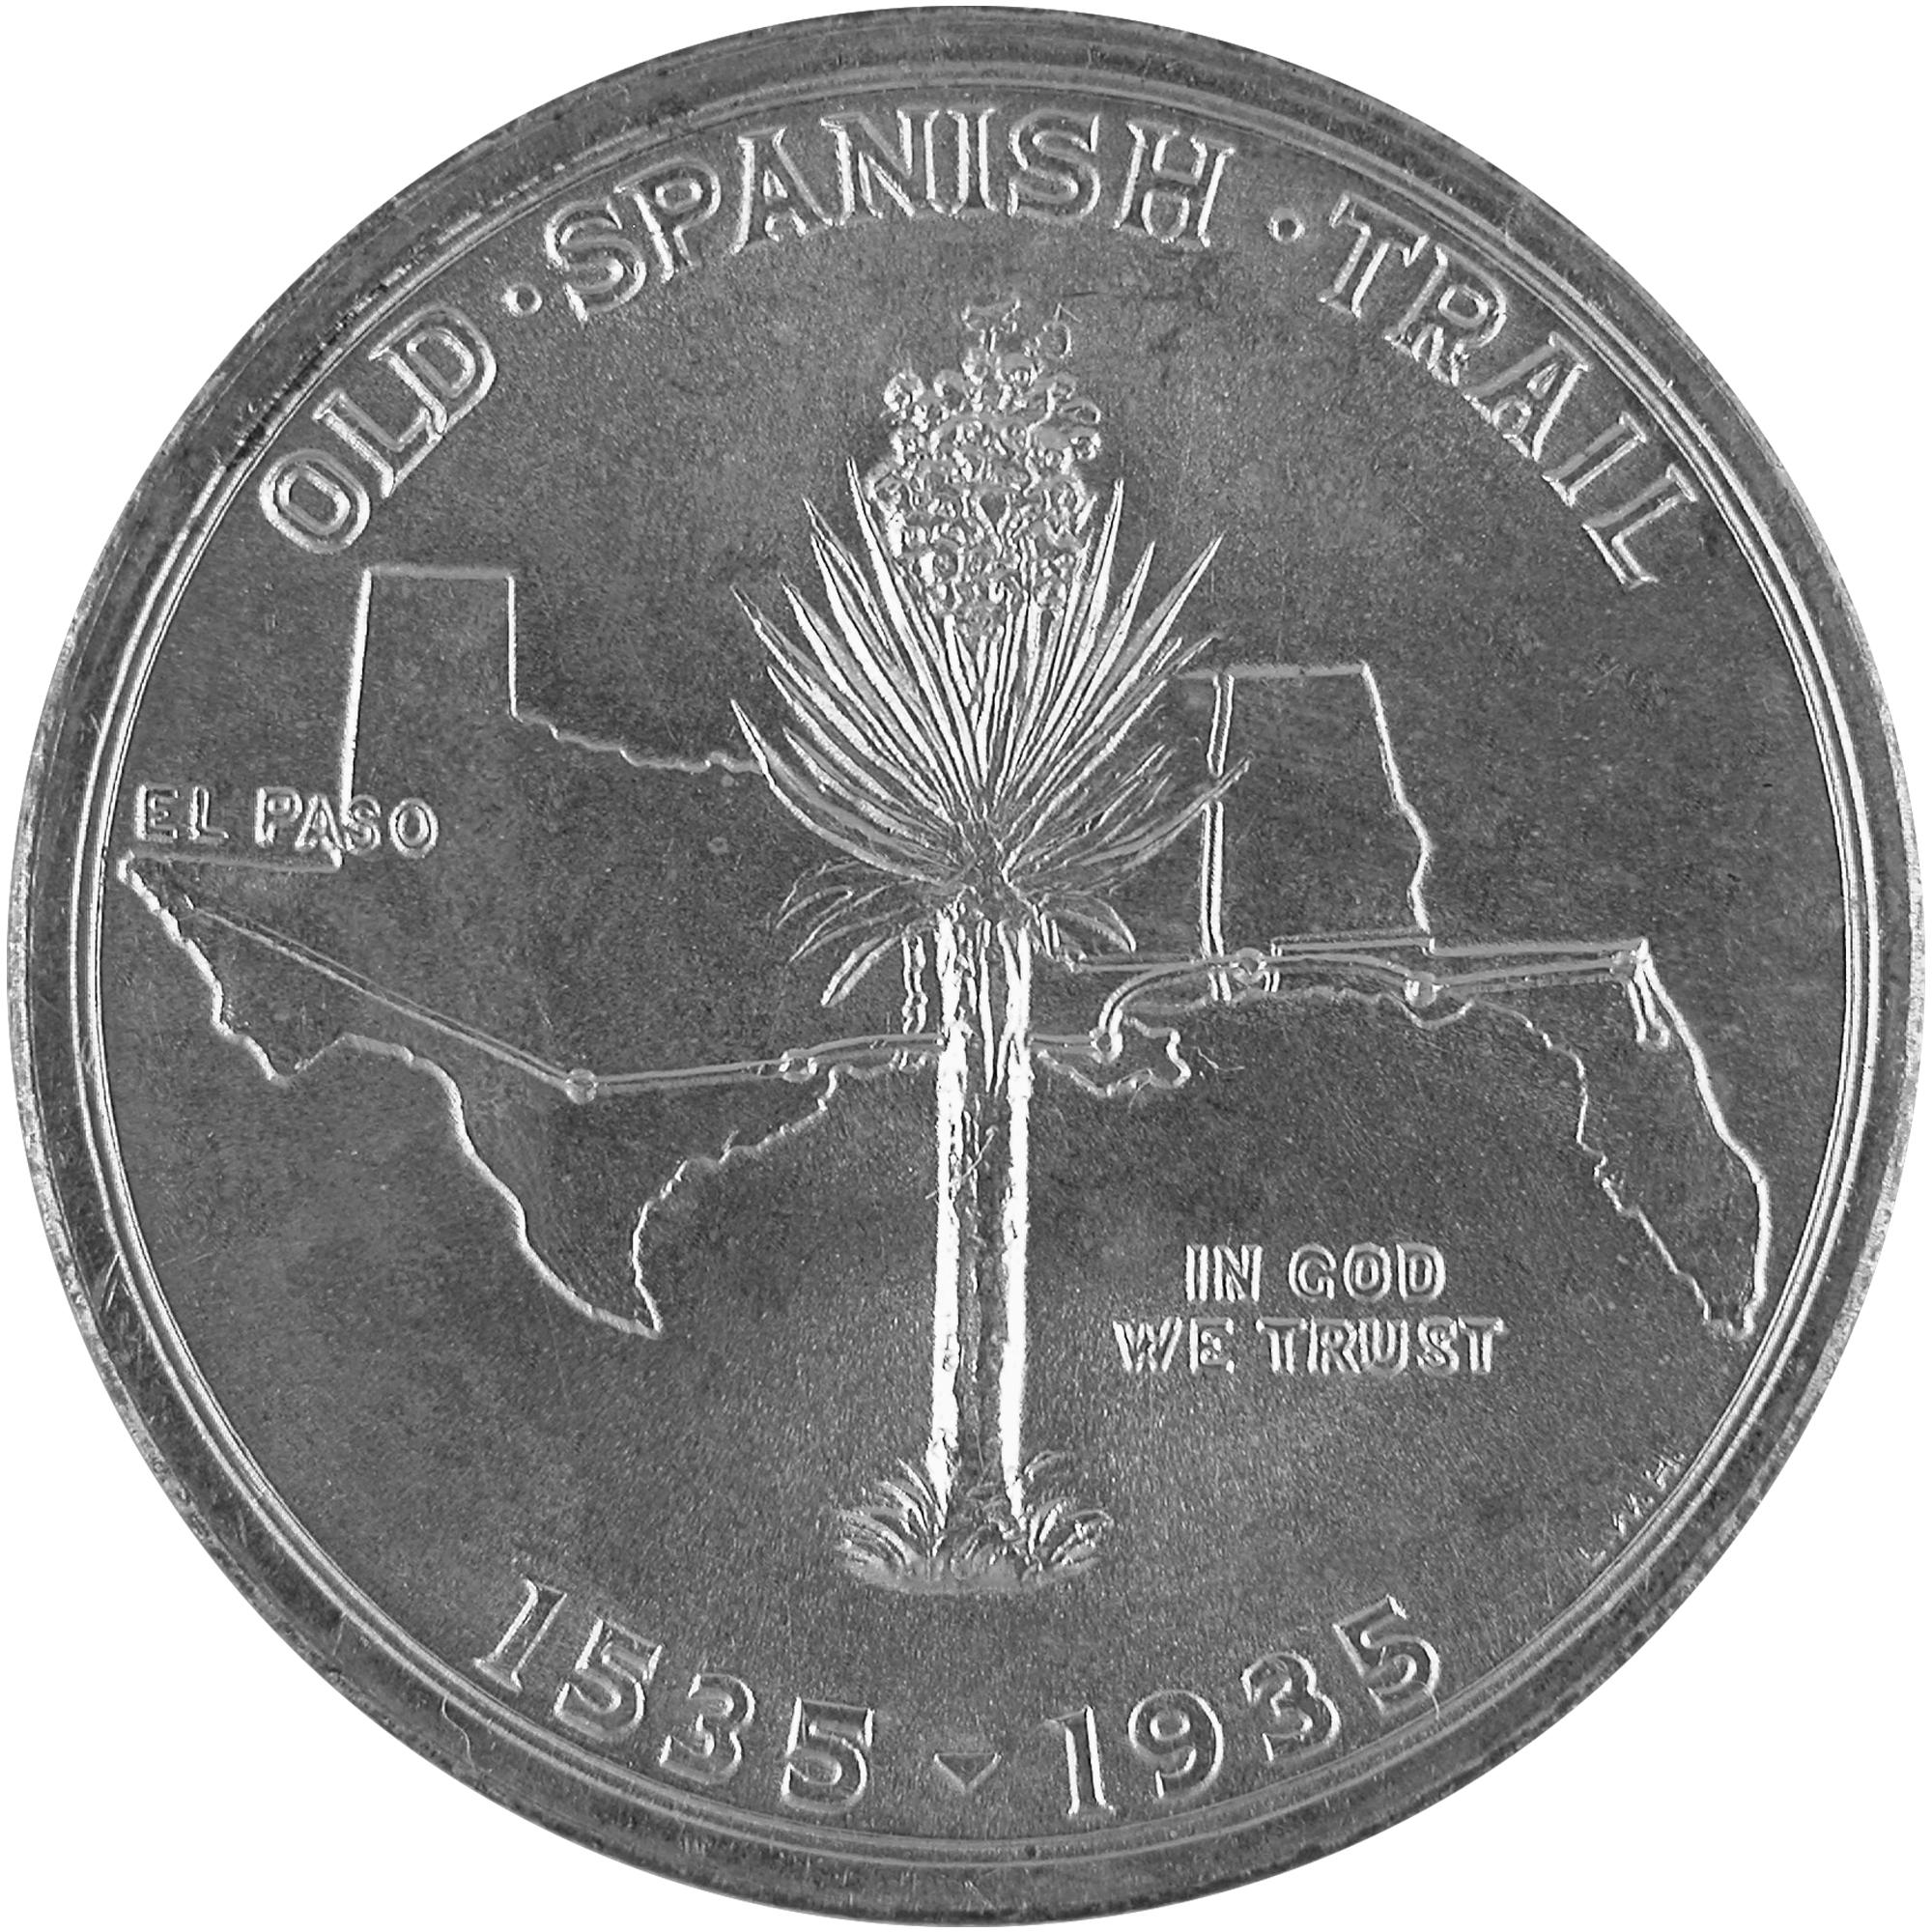 1935 Old Spanish Trail Quadricentennial Commemorative Silver Half Dollar Coin Reverse